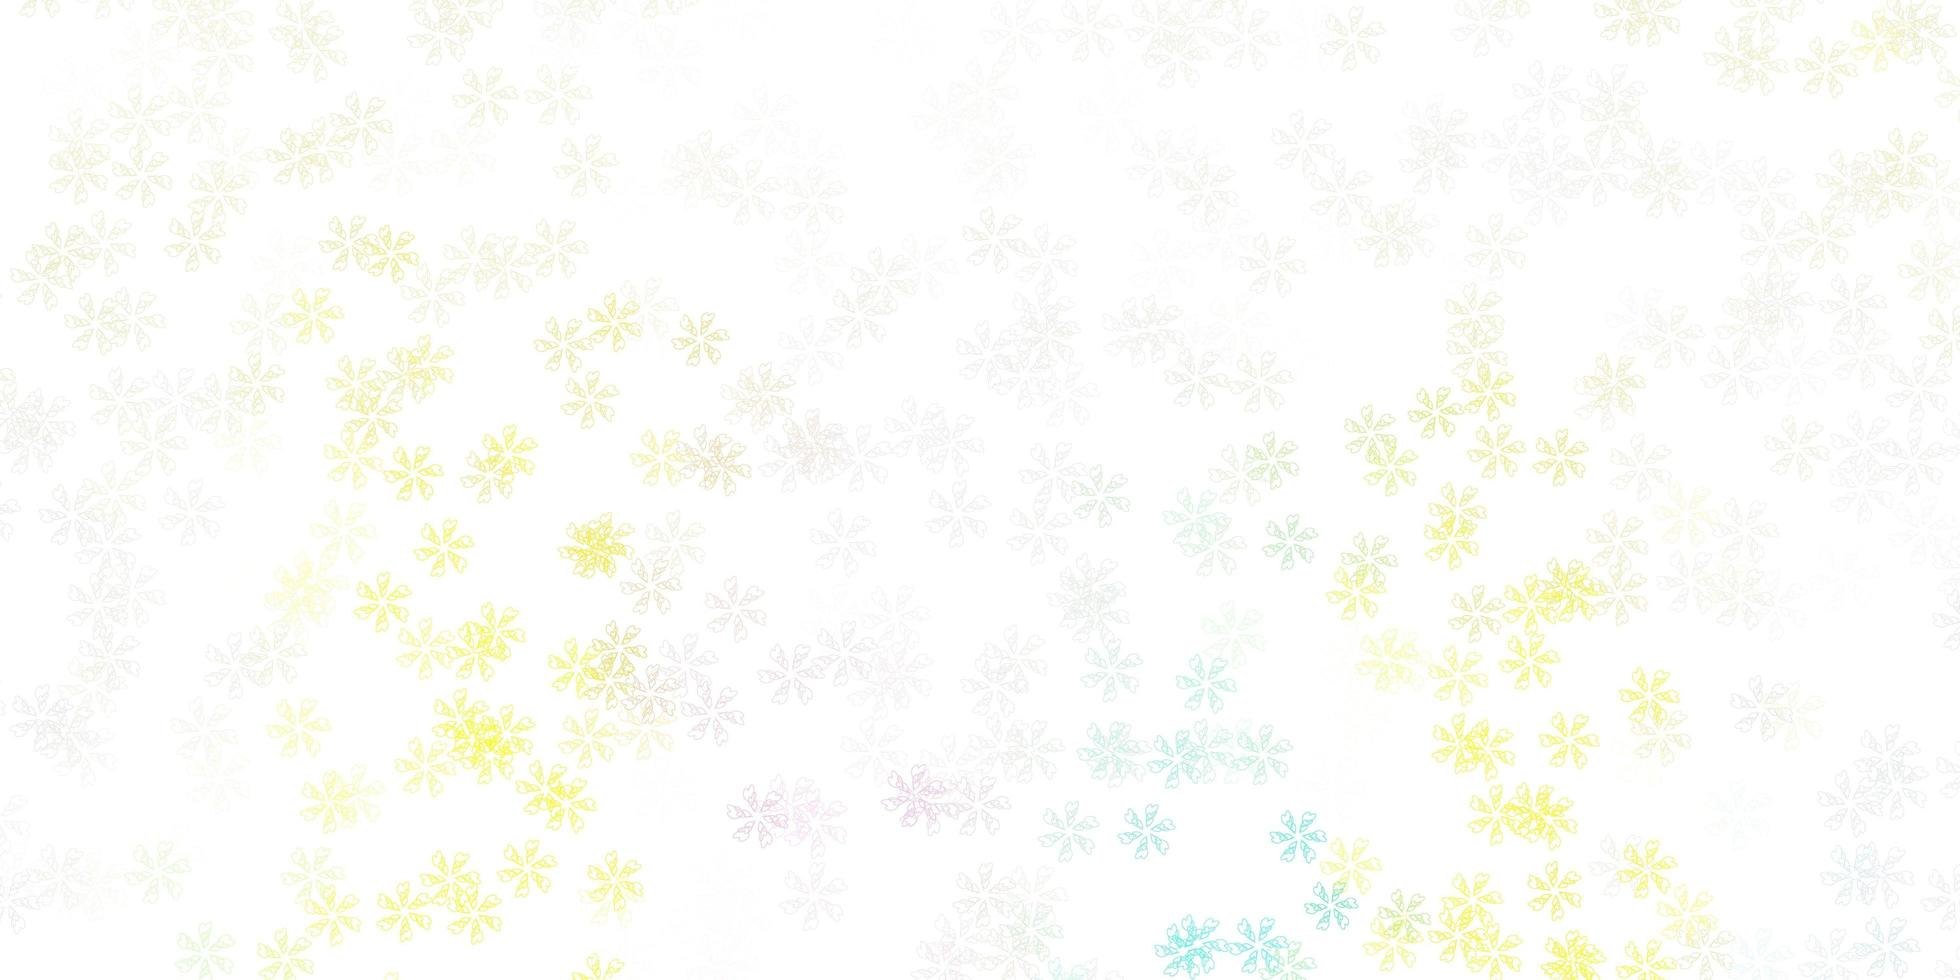 layout abstrato luz multicolor vetor com folhas.